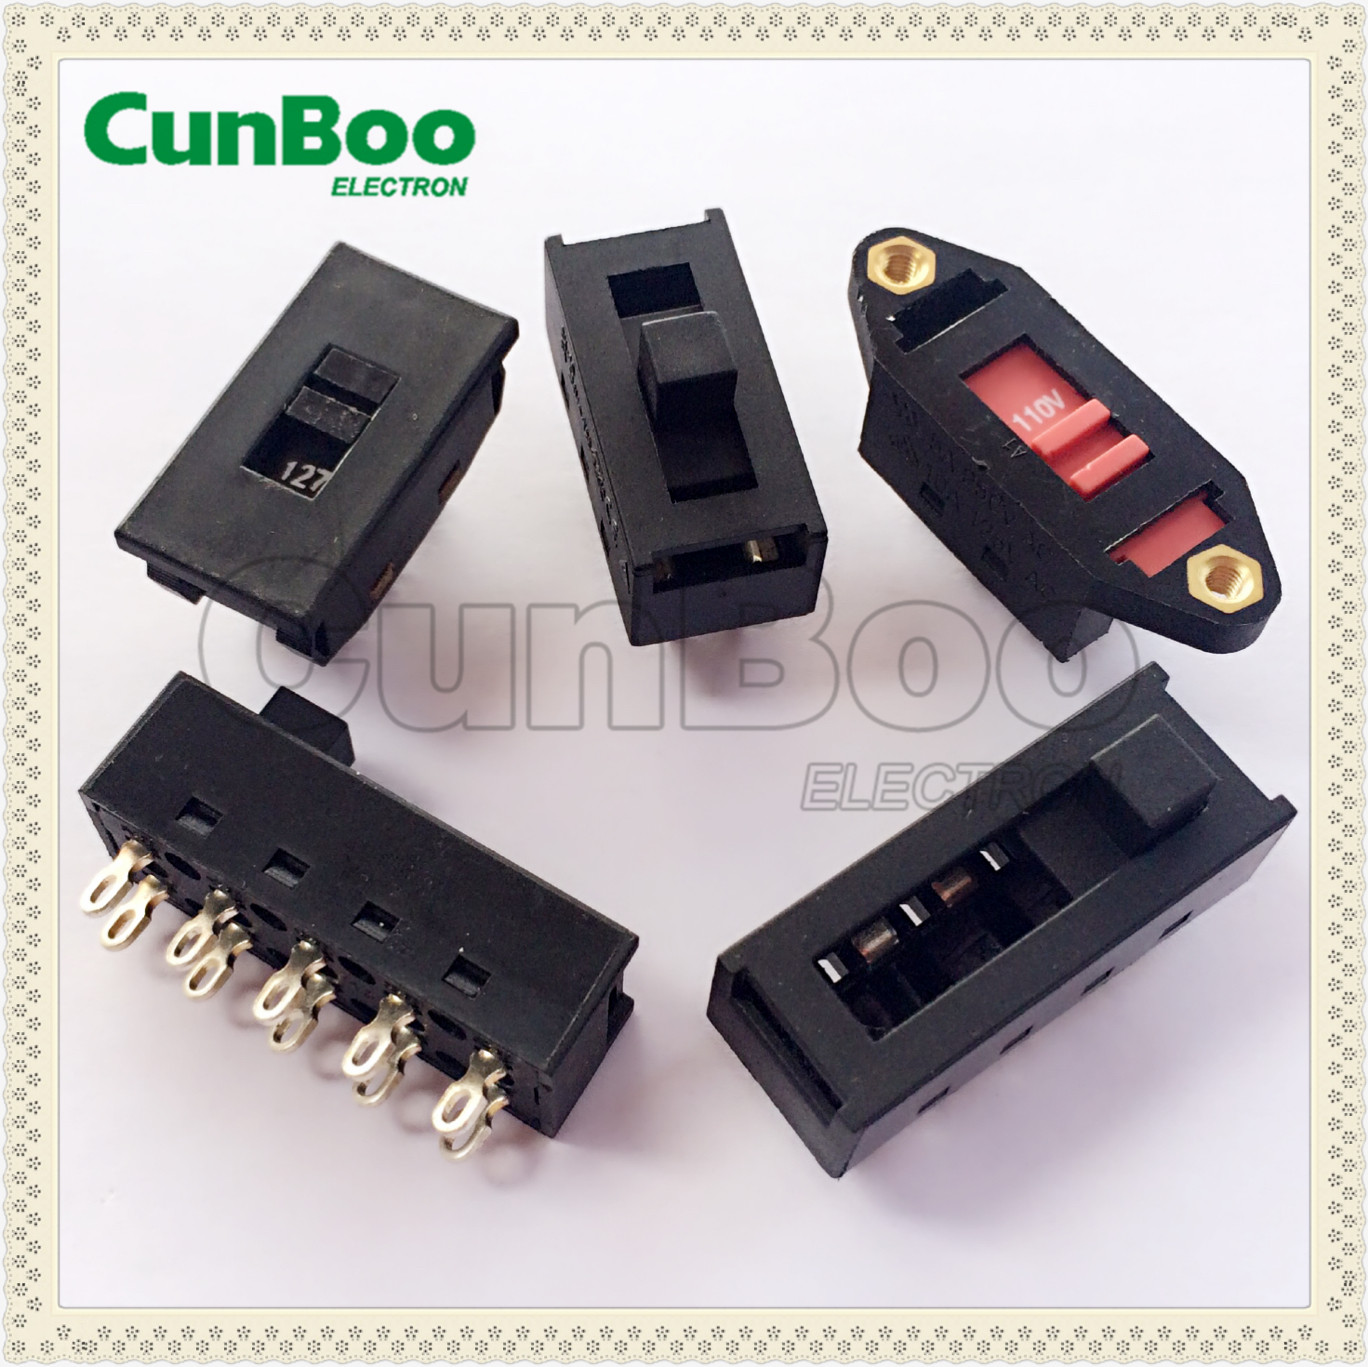 8A slider switch